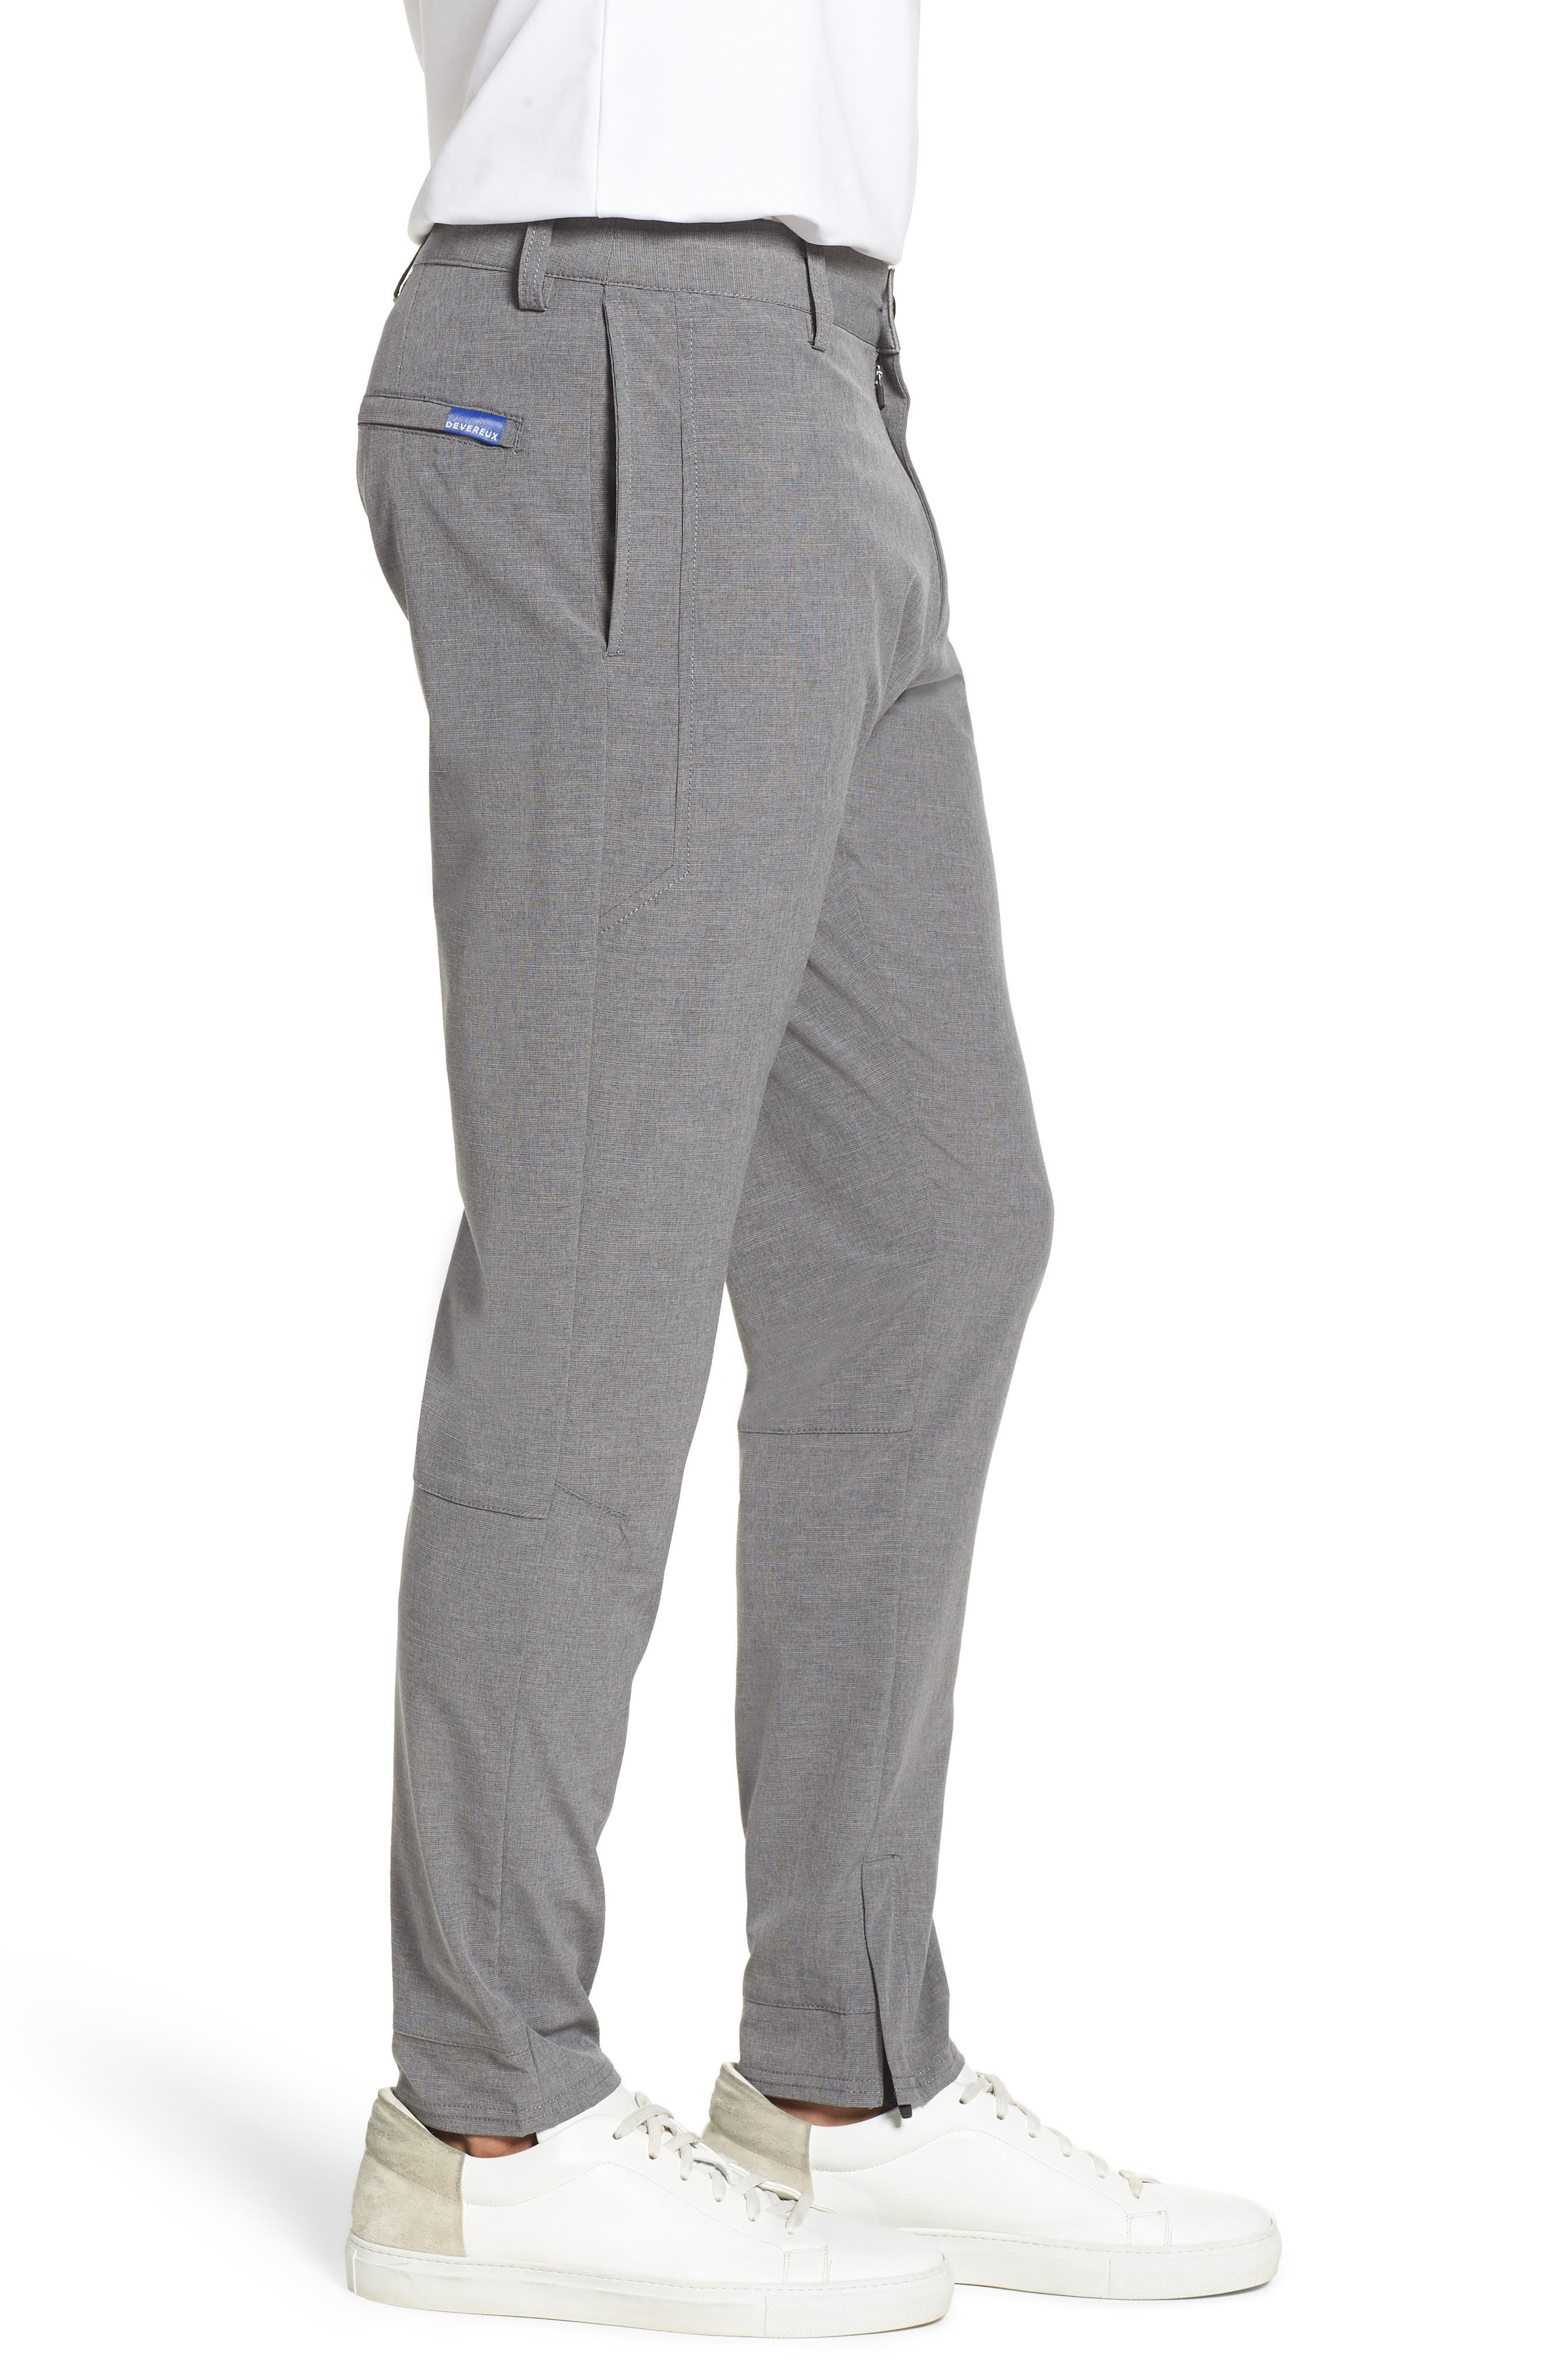 Gravity Athletic Fit Pants,                             Alternate thumbnail 3, color,                             Charcoal